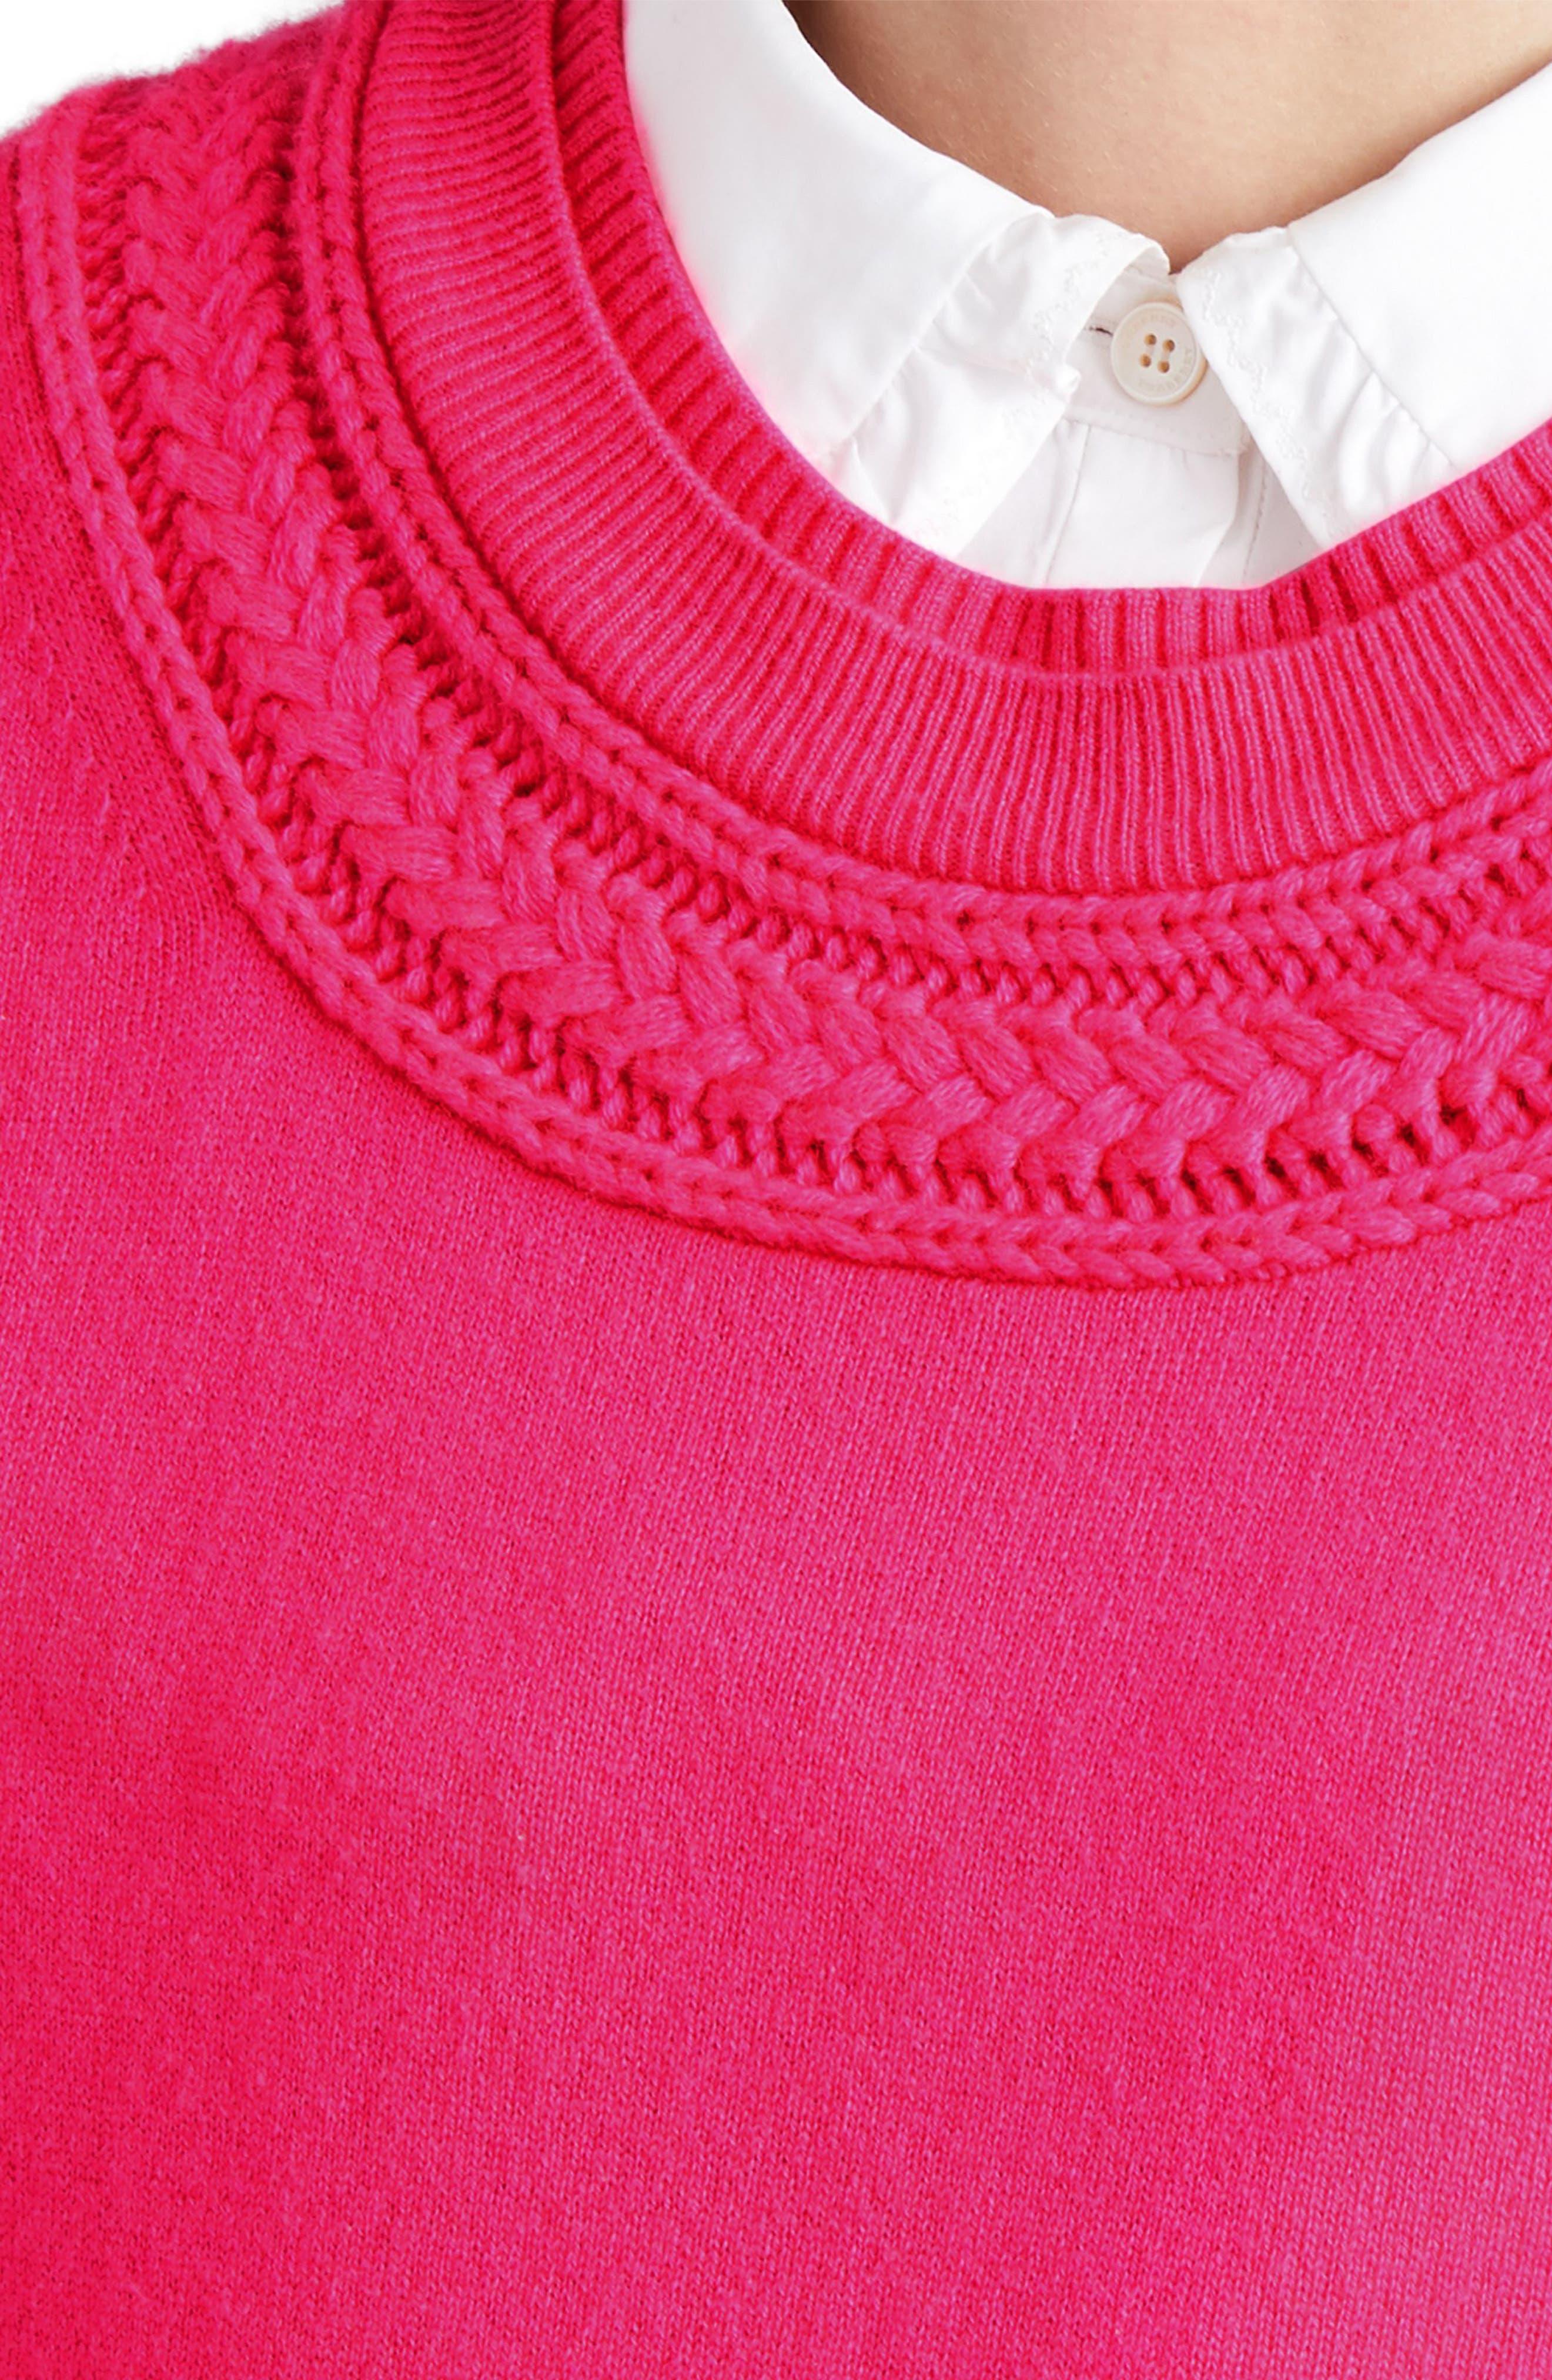 Guadaira Cashmere Sweater,                             Alternate thumbnail 4, color,                             671